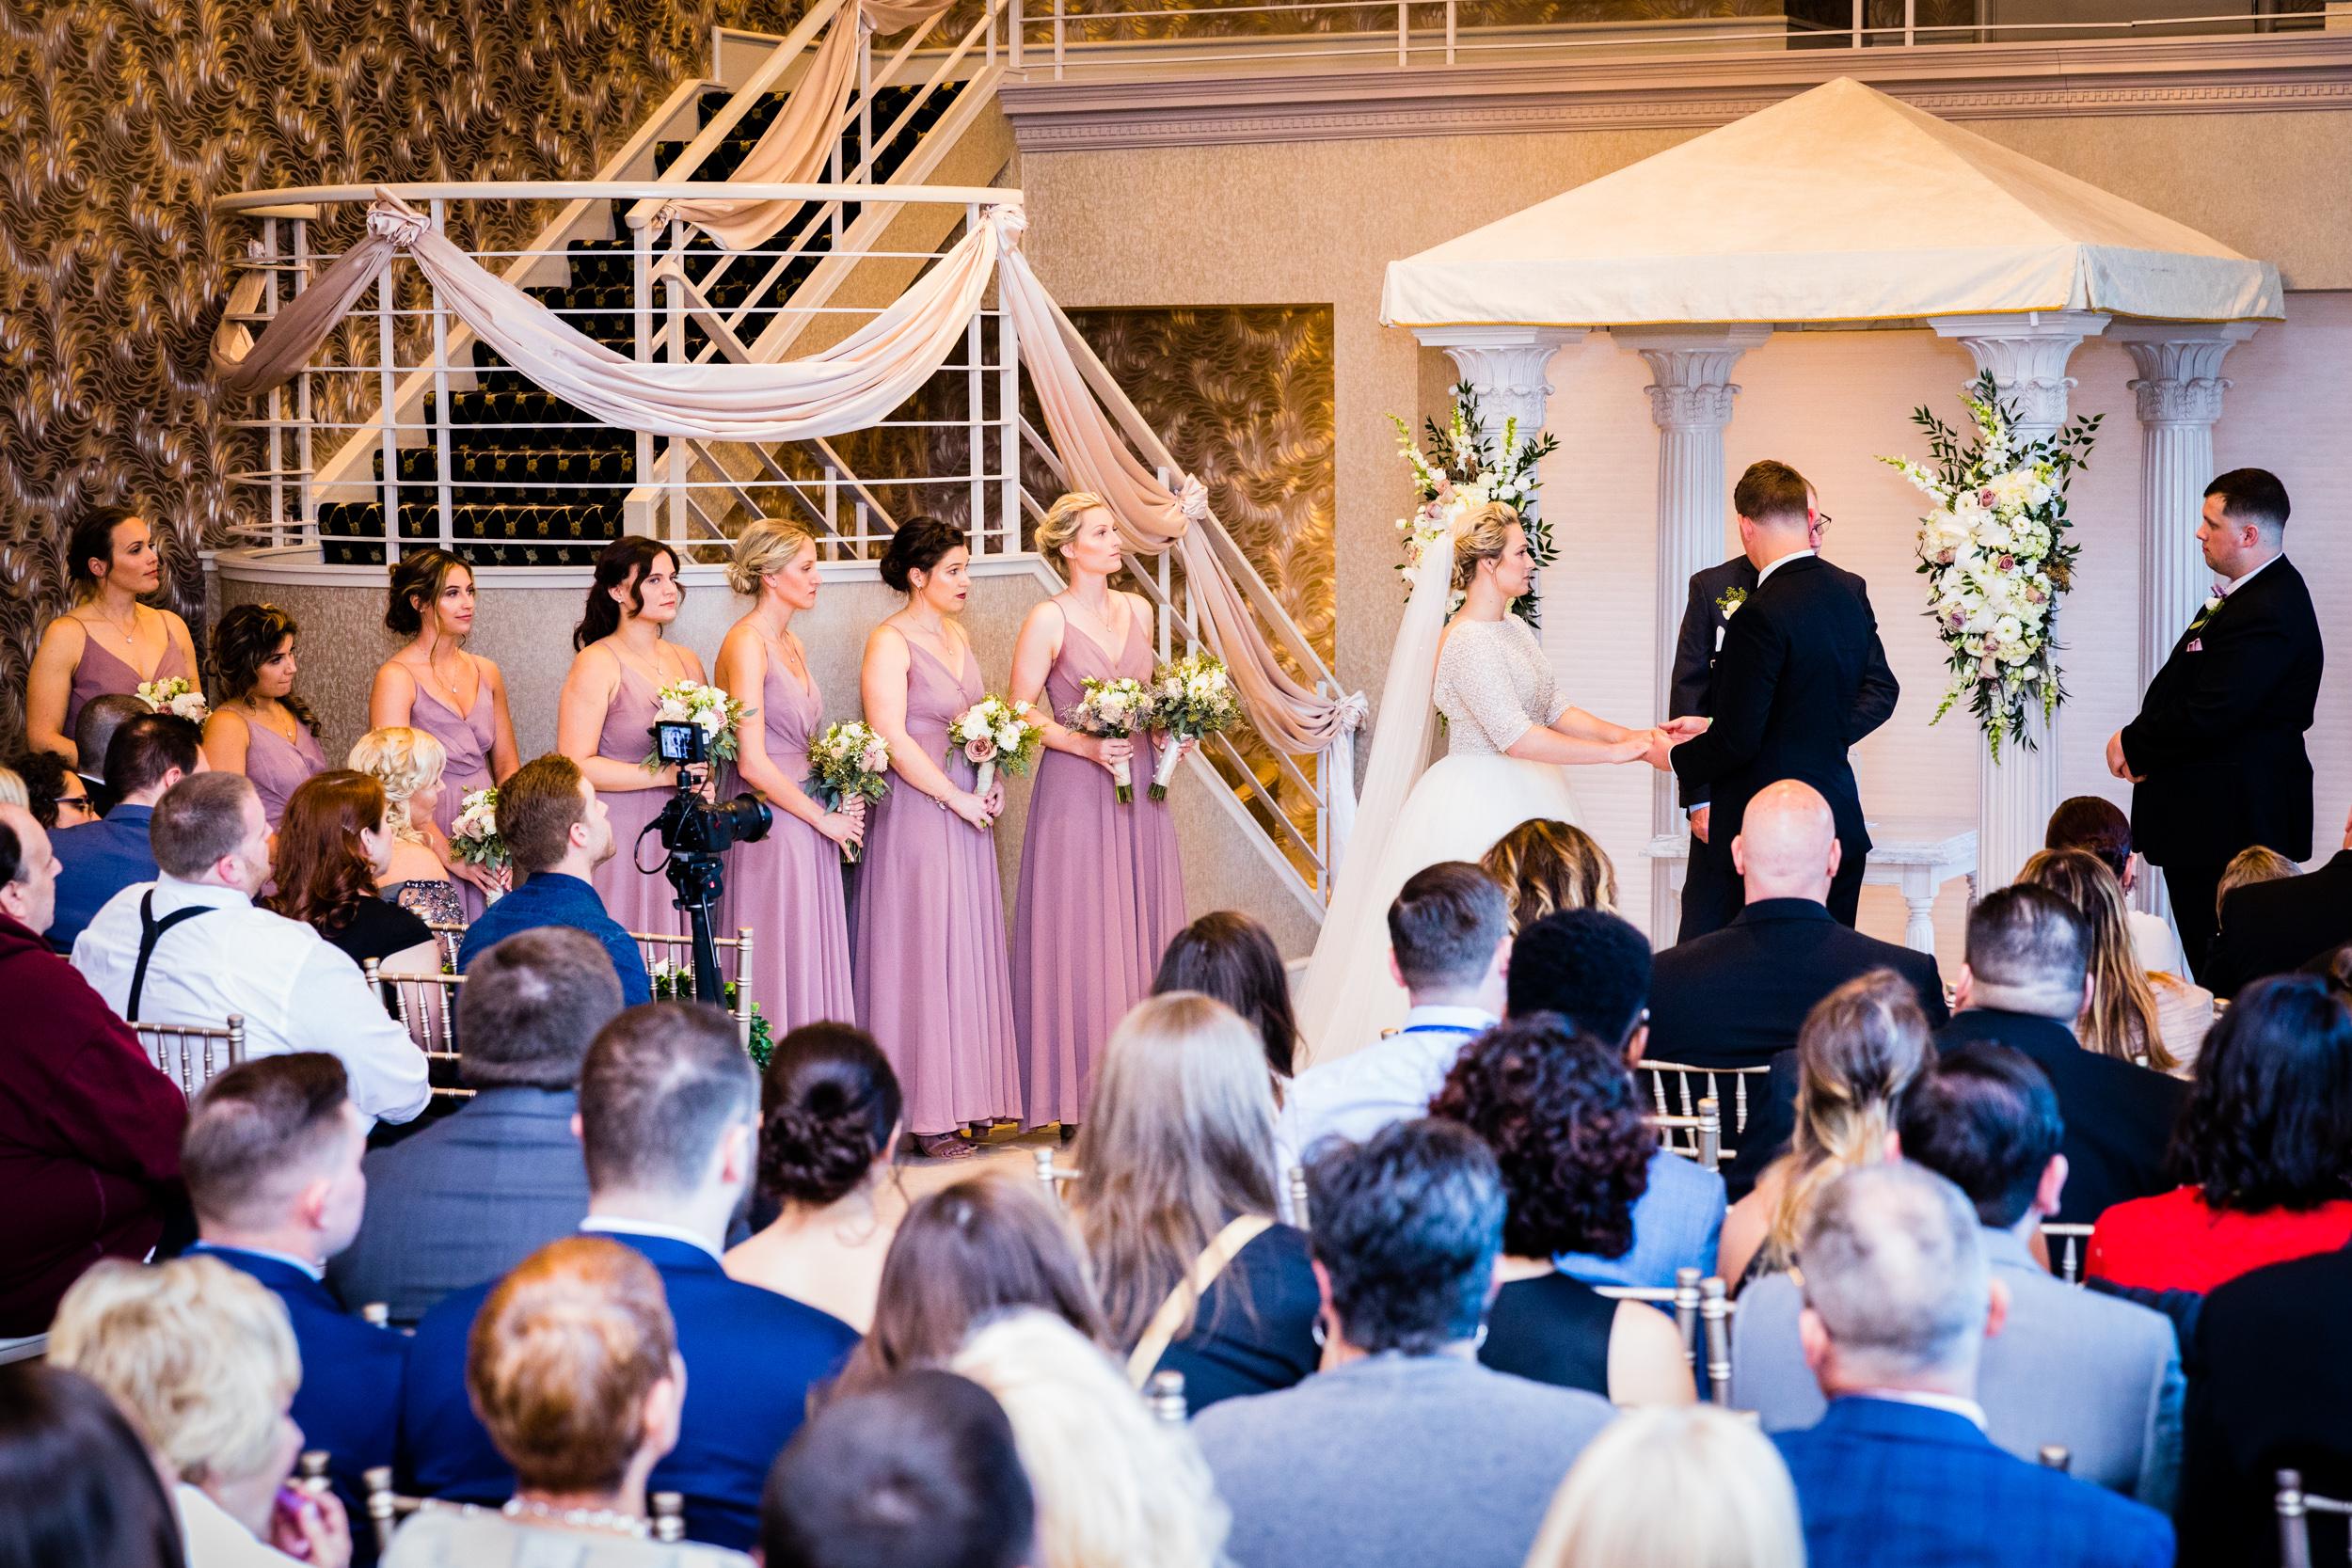 CELEBRATIONS BENSALEM WEDDING PHOTOGRAPHY-53.jpg